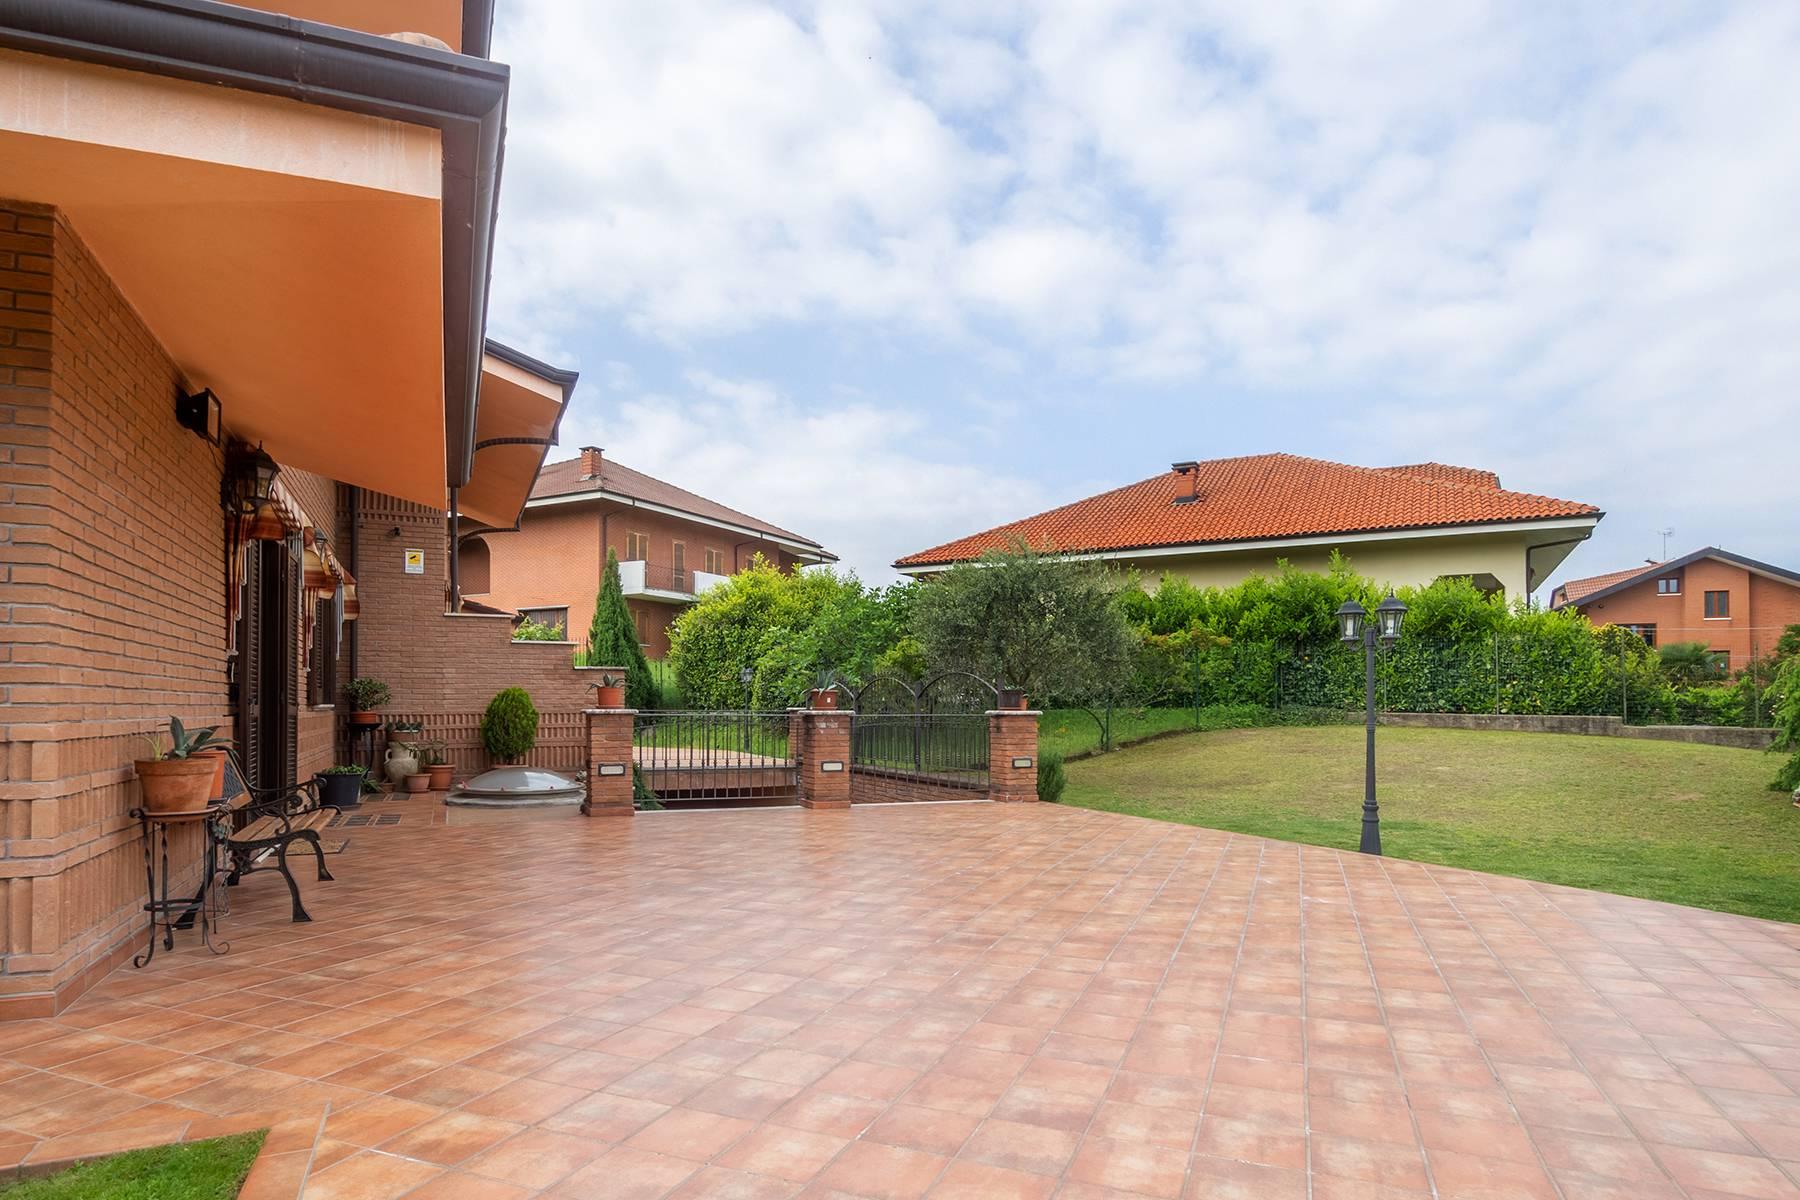 Villa in Vendita a Rosta: 5 locali, 182 mq - Foto 8